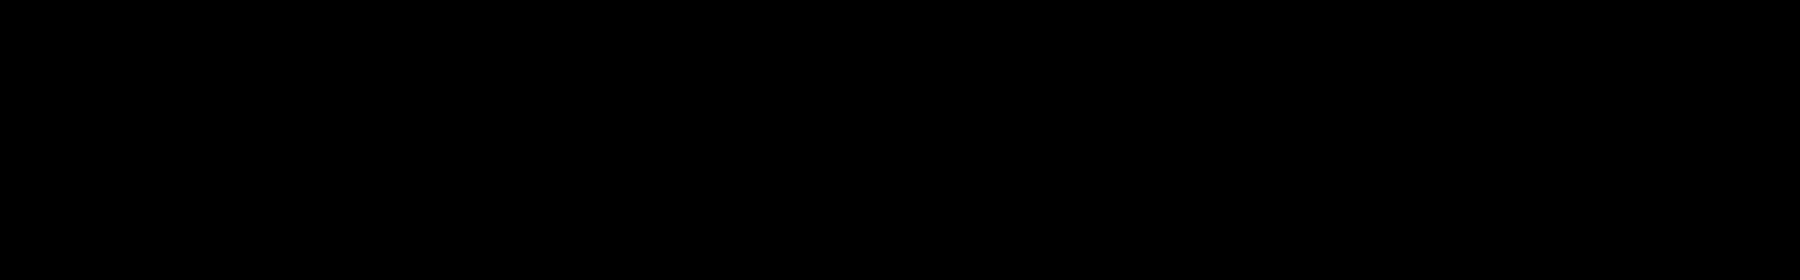 Retro Noir audio waveform